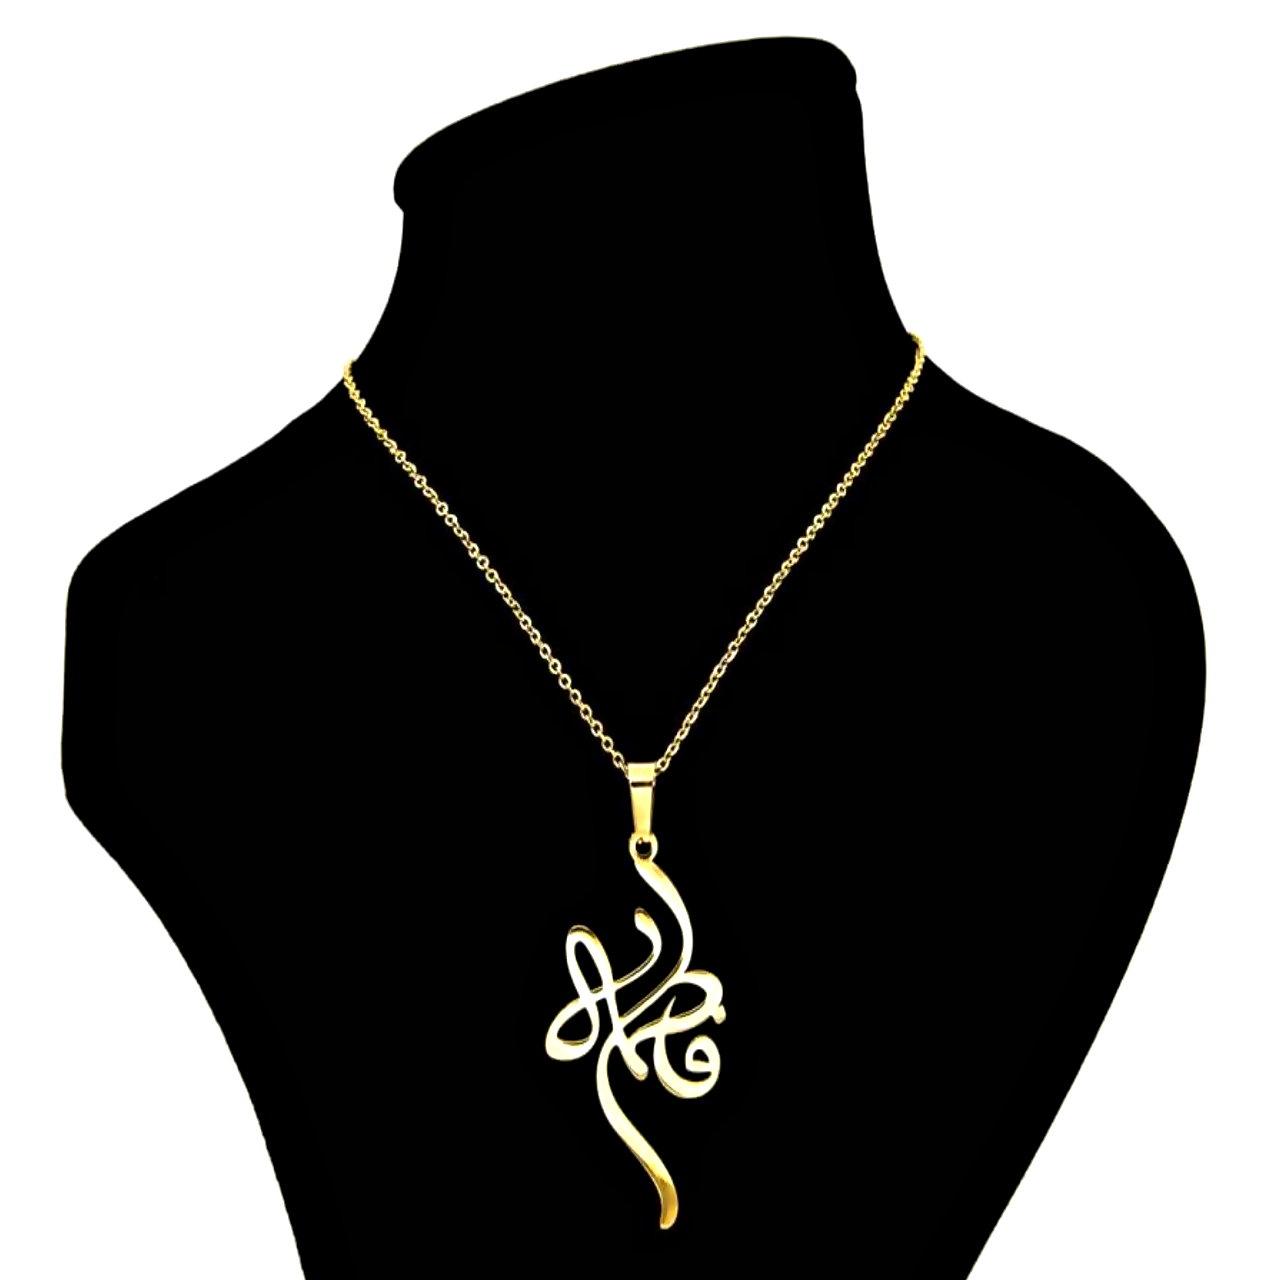 عکس گردنبند طلا 18 عیار زنانه آمانژ طرح اسم فاطمه کد D2146